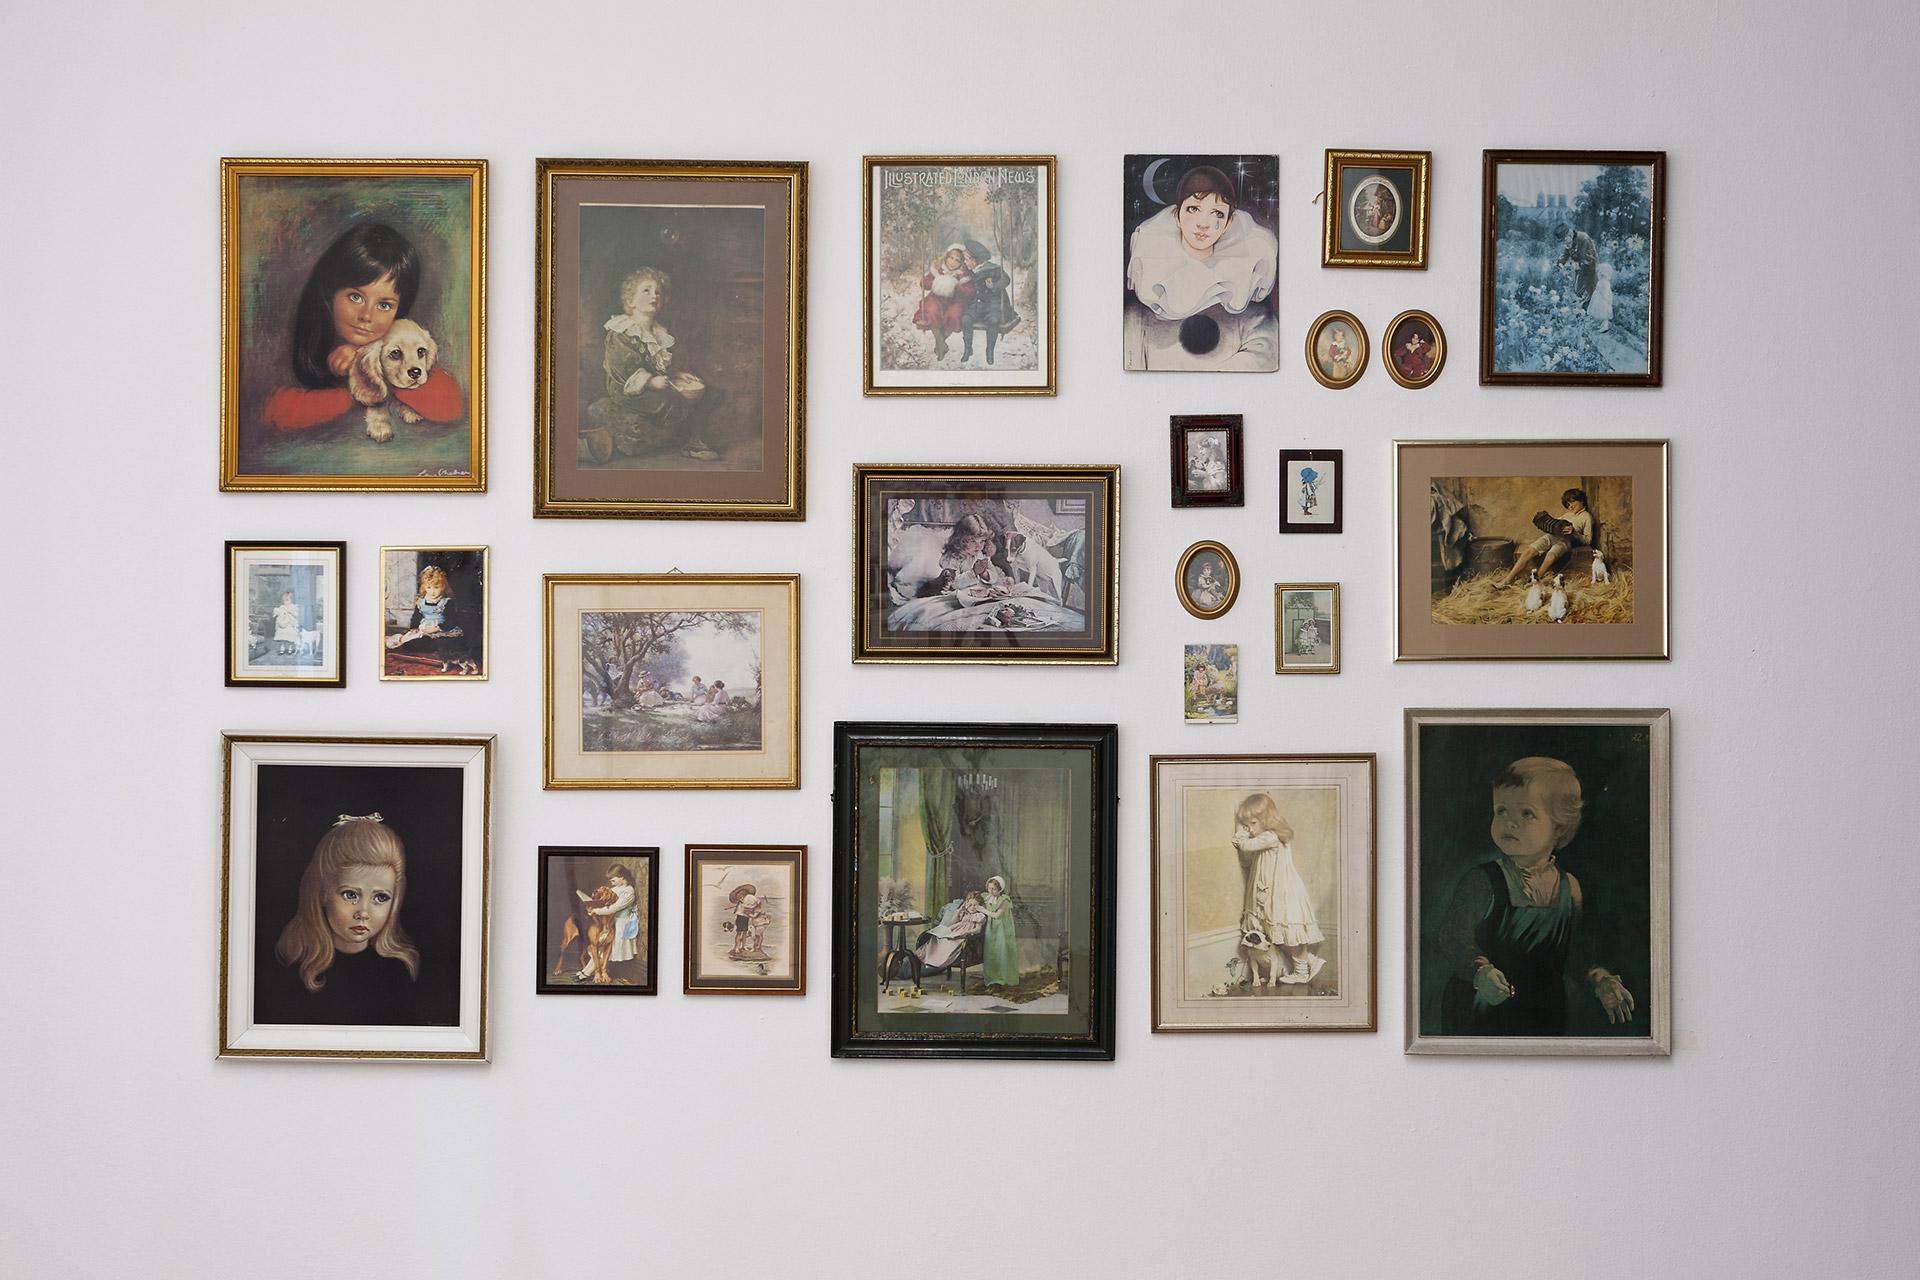 Andy-Holden-Kunsthalle-Winterthur-2015-3.jpg